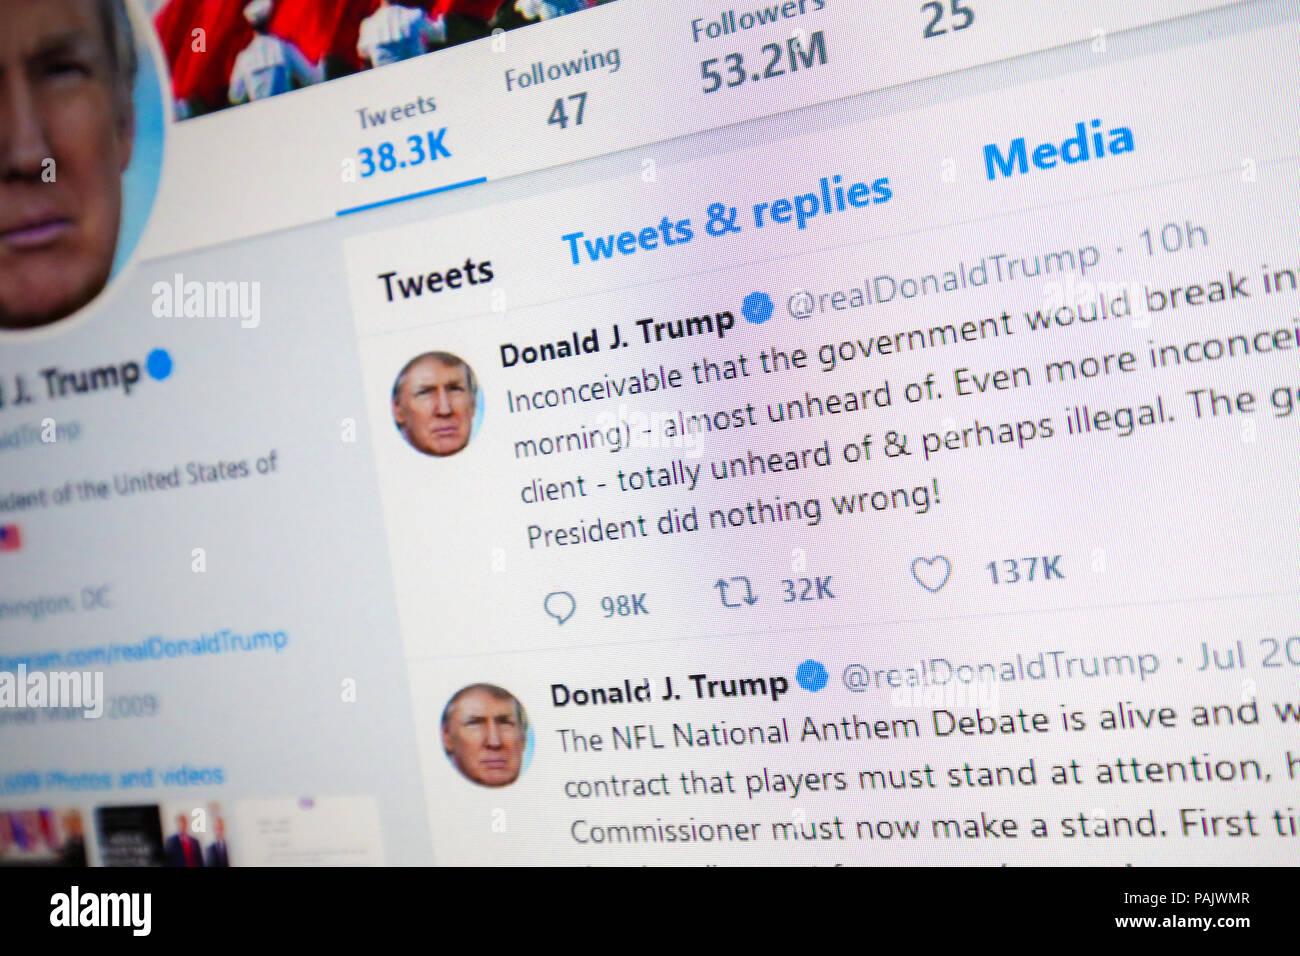 Donald Trump Twitter Profile Stock Photos & Donald Trump Twitter